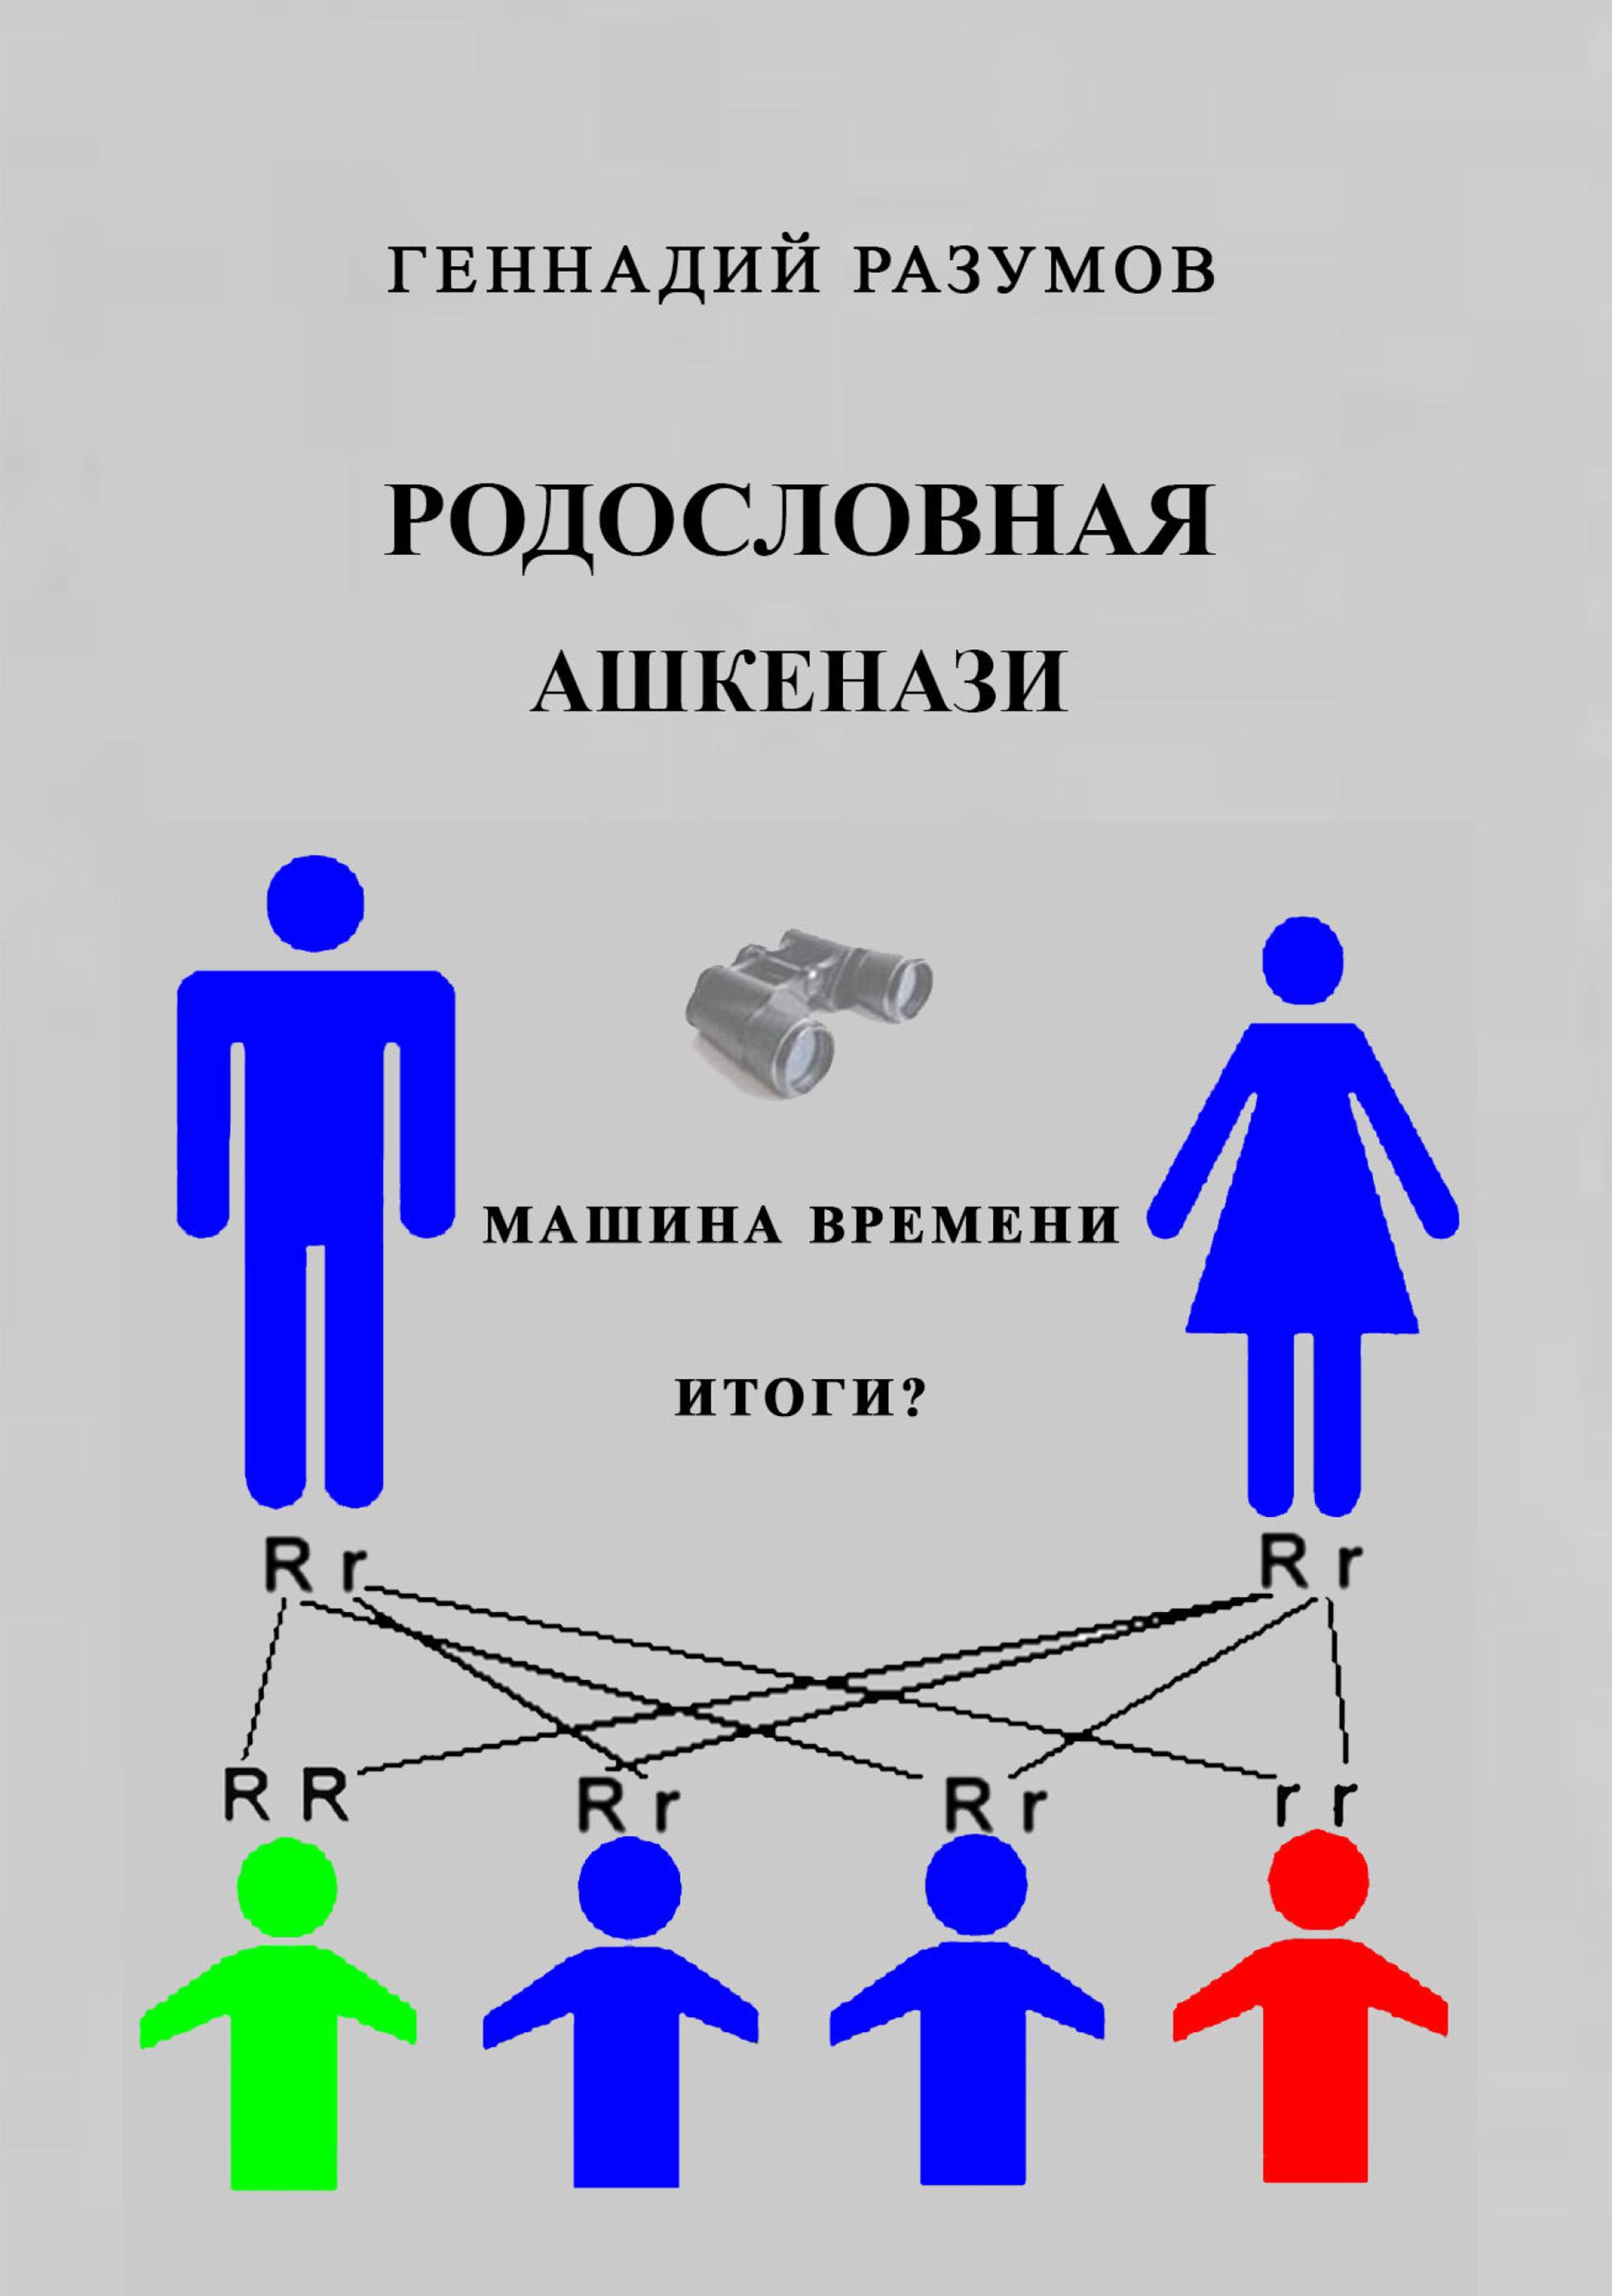 Геннадий Разумов Родословная ашкенази